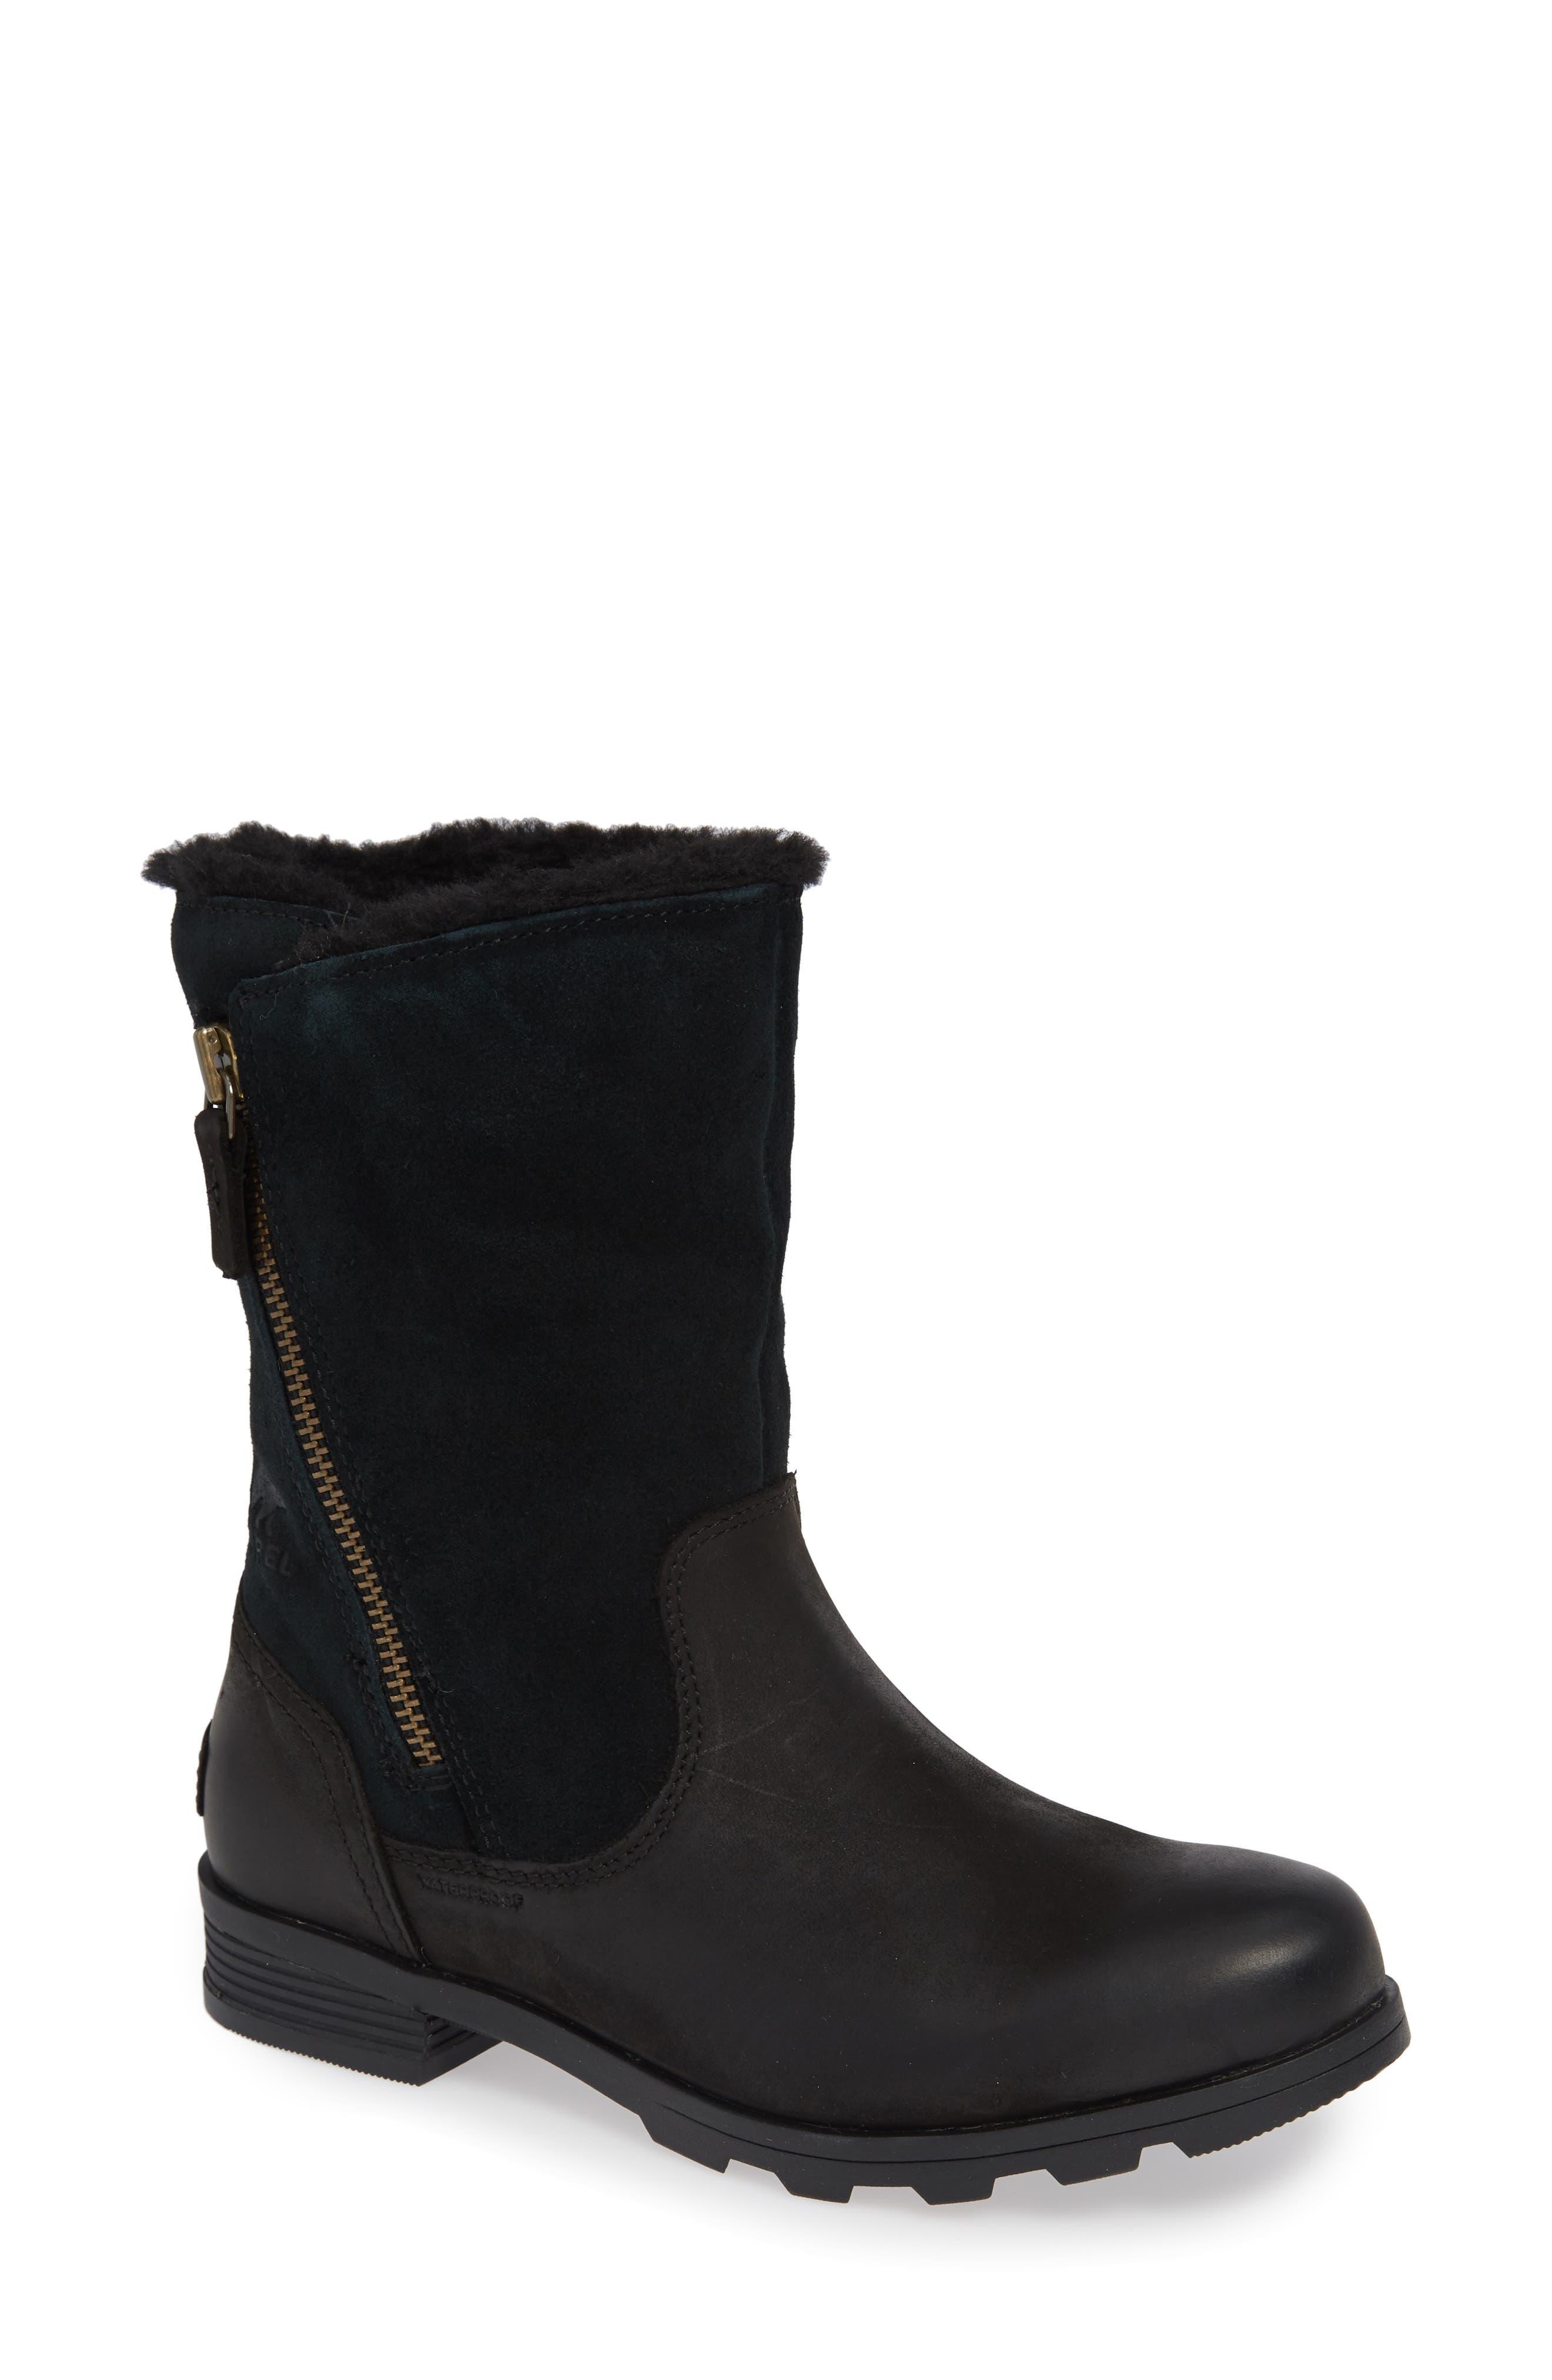 Emelie Waterproof Faux Fur Lined Boot,                             Main thumbnail 1, color,                             BLACK